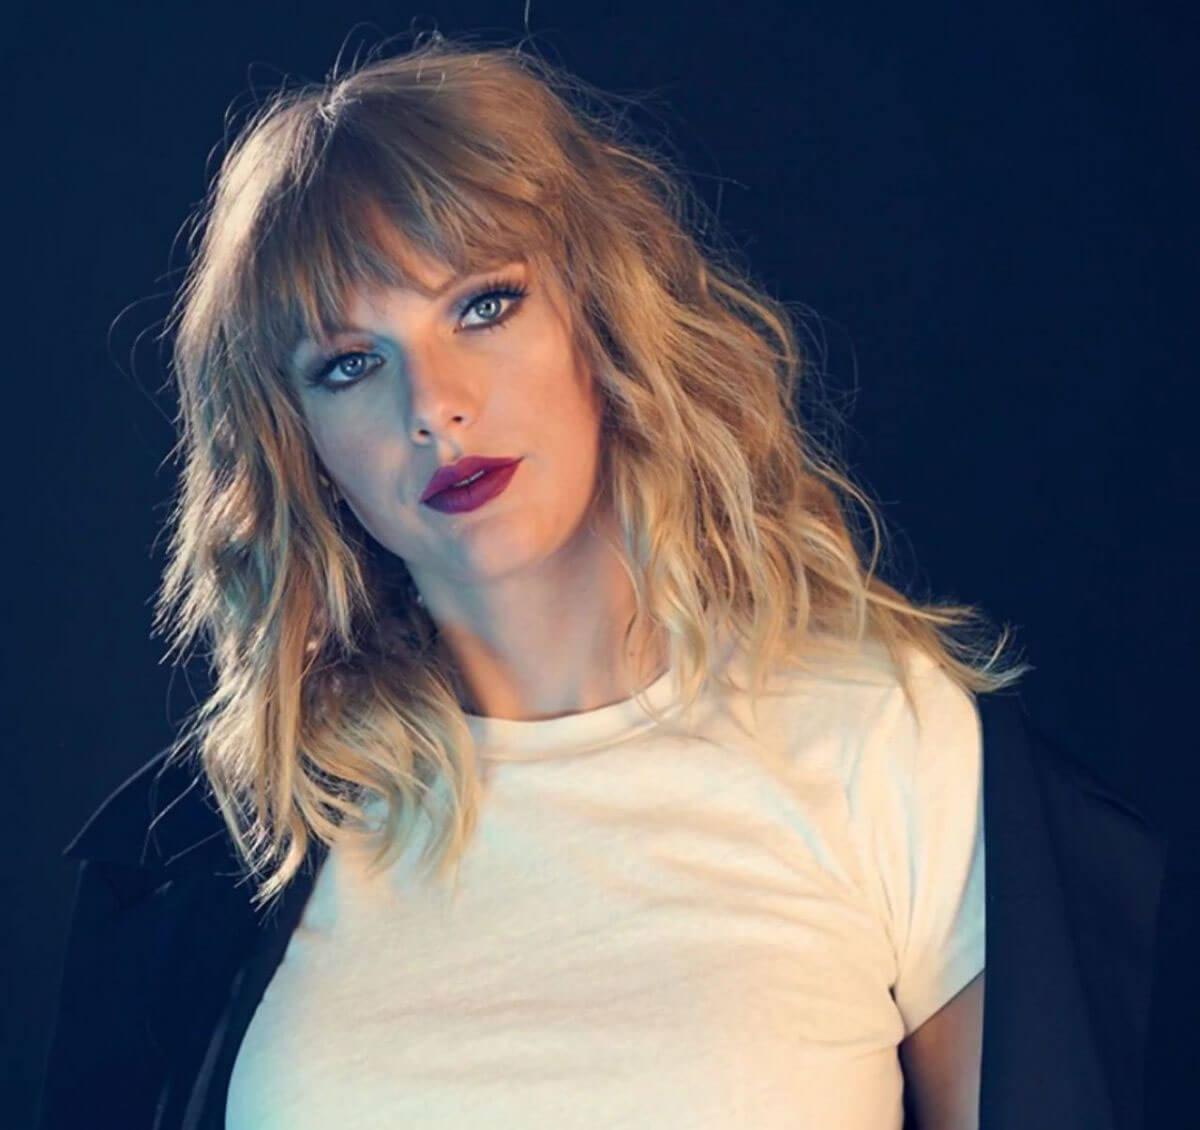 File:Taylor.jpg